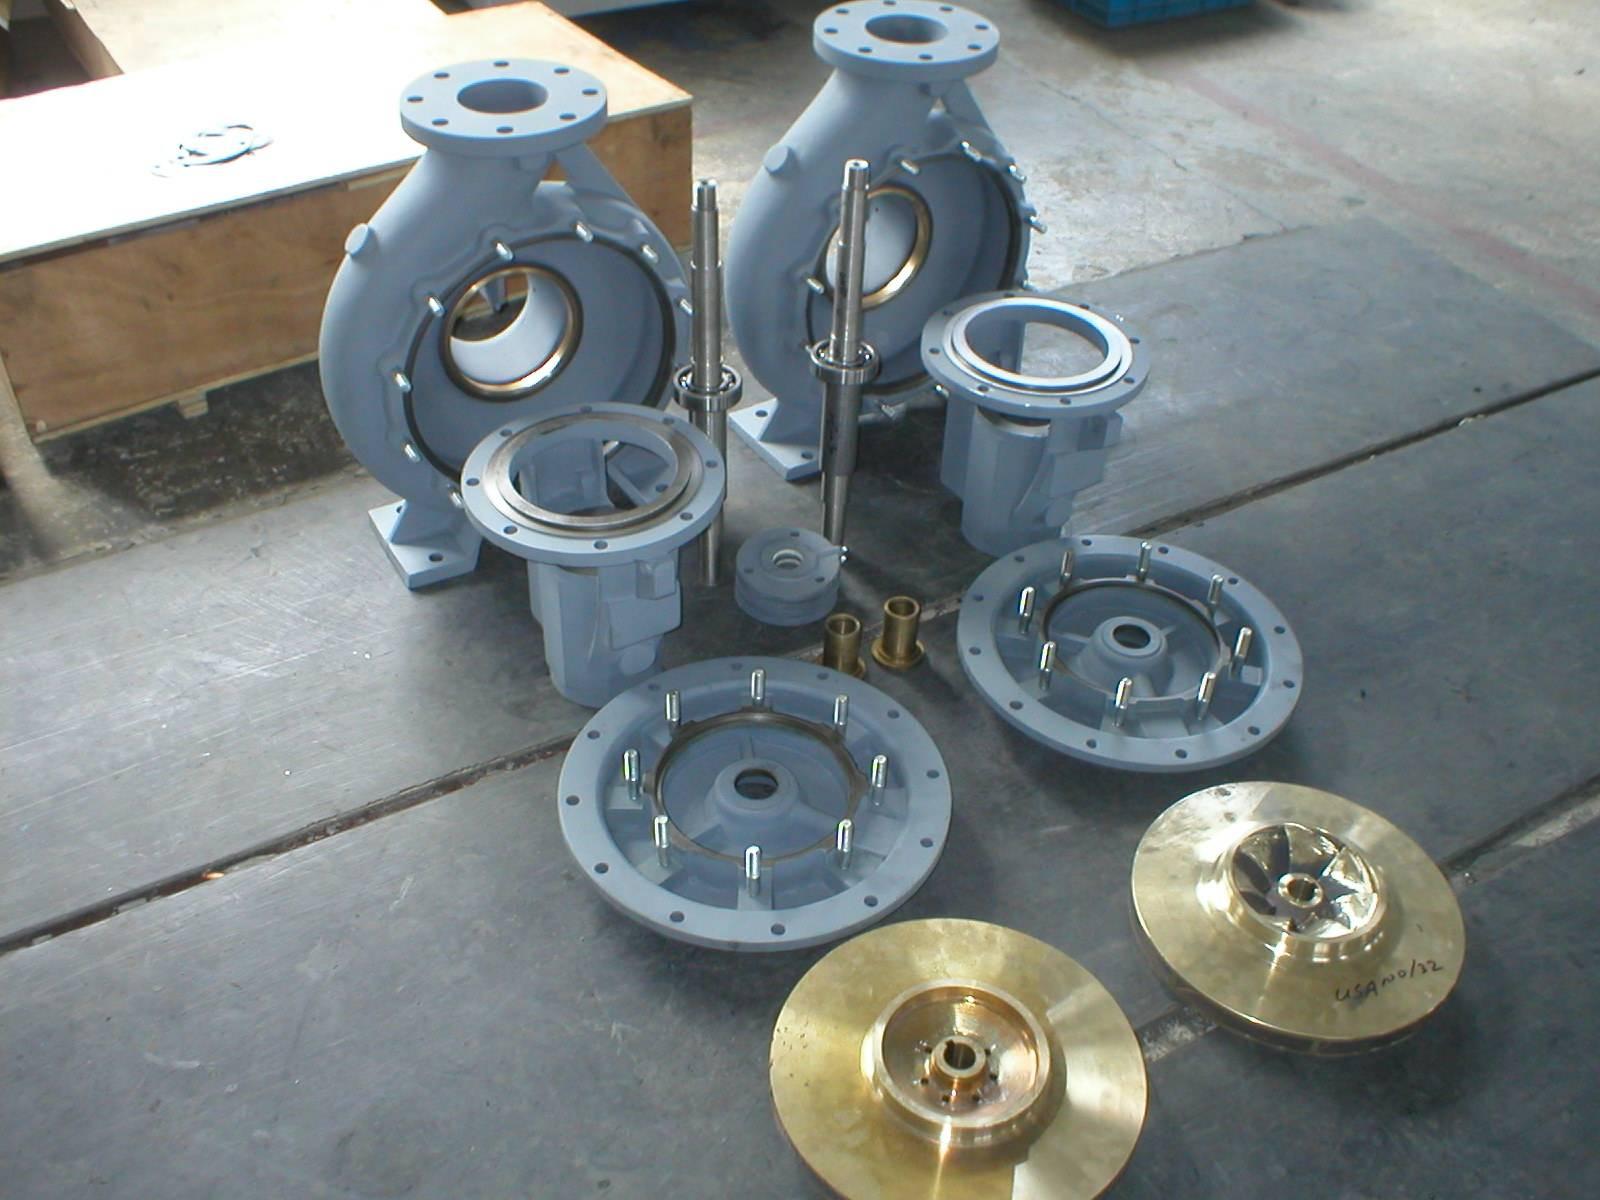 Kenflo ISO2858 Pump, Aquaplus ISO, southern cross star-line, star-pro